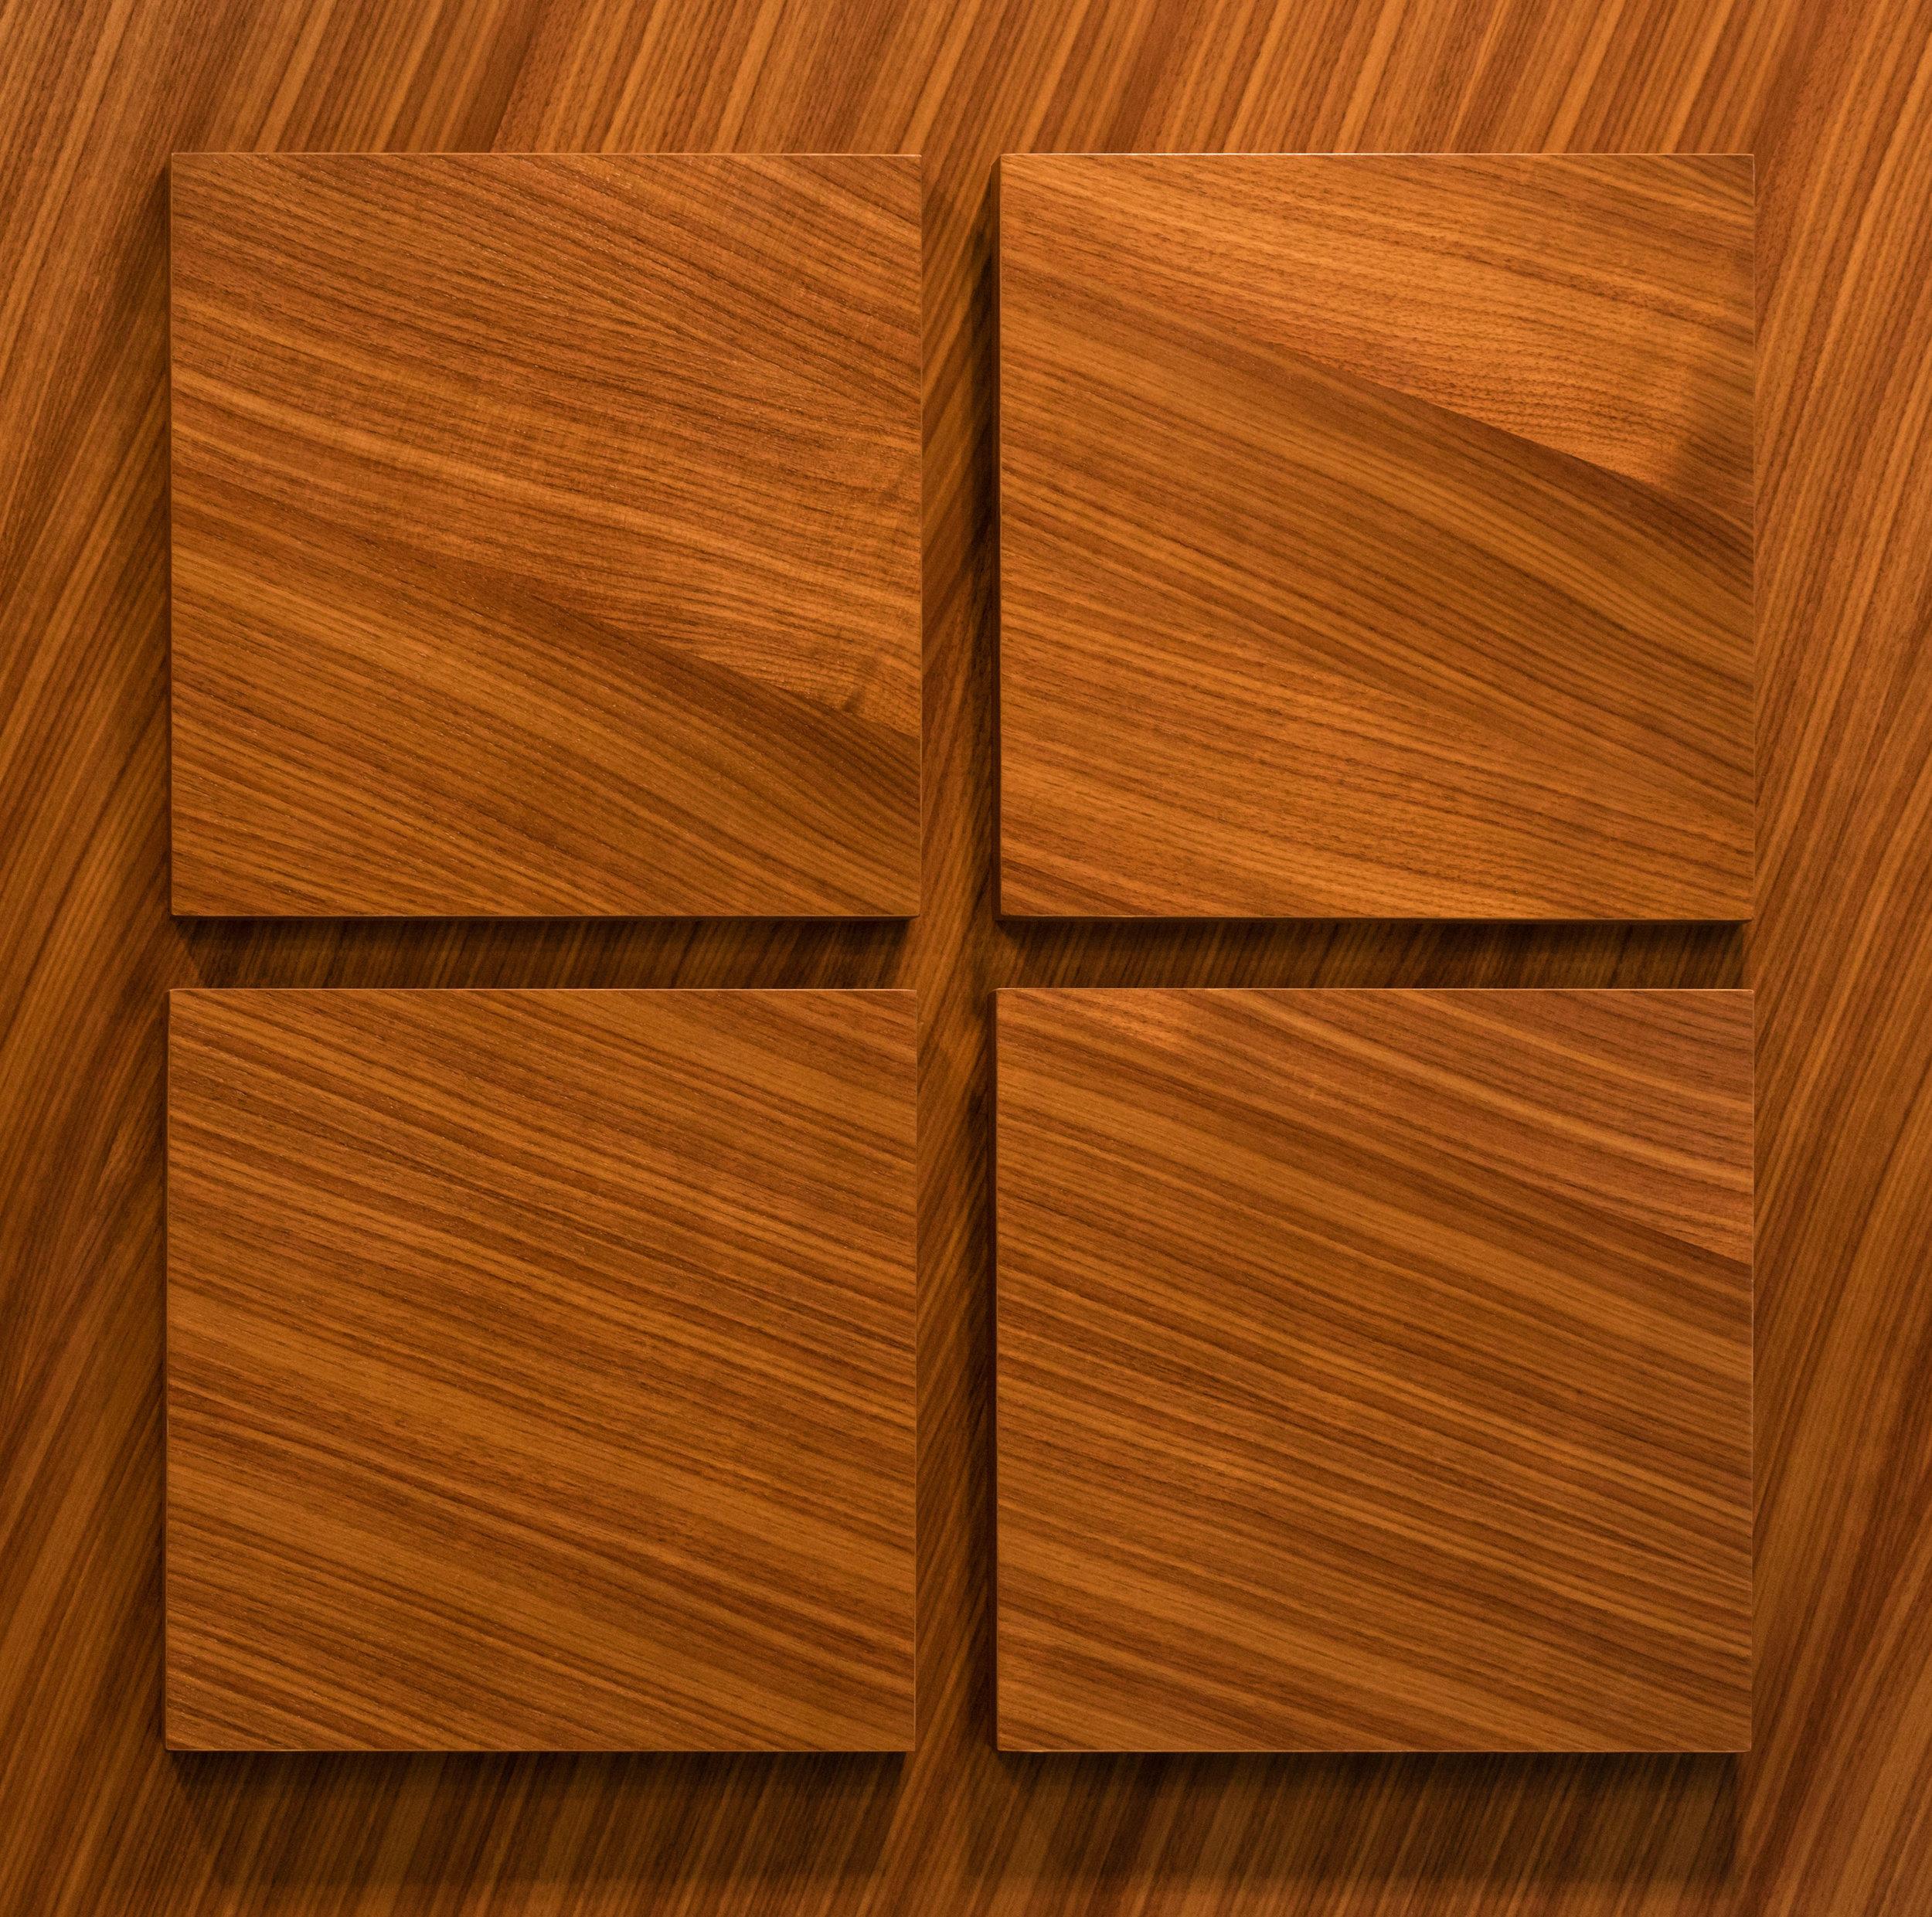 microsoft-center_coorporate-interior-design_coordination-berlin_10.jpg